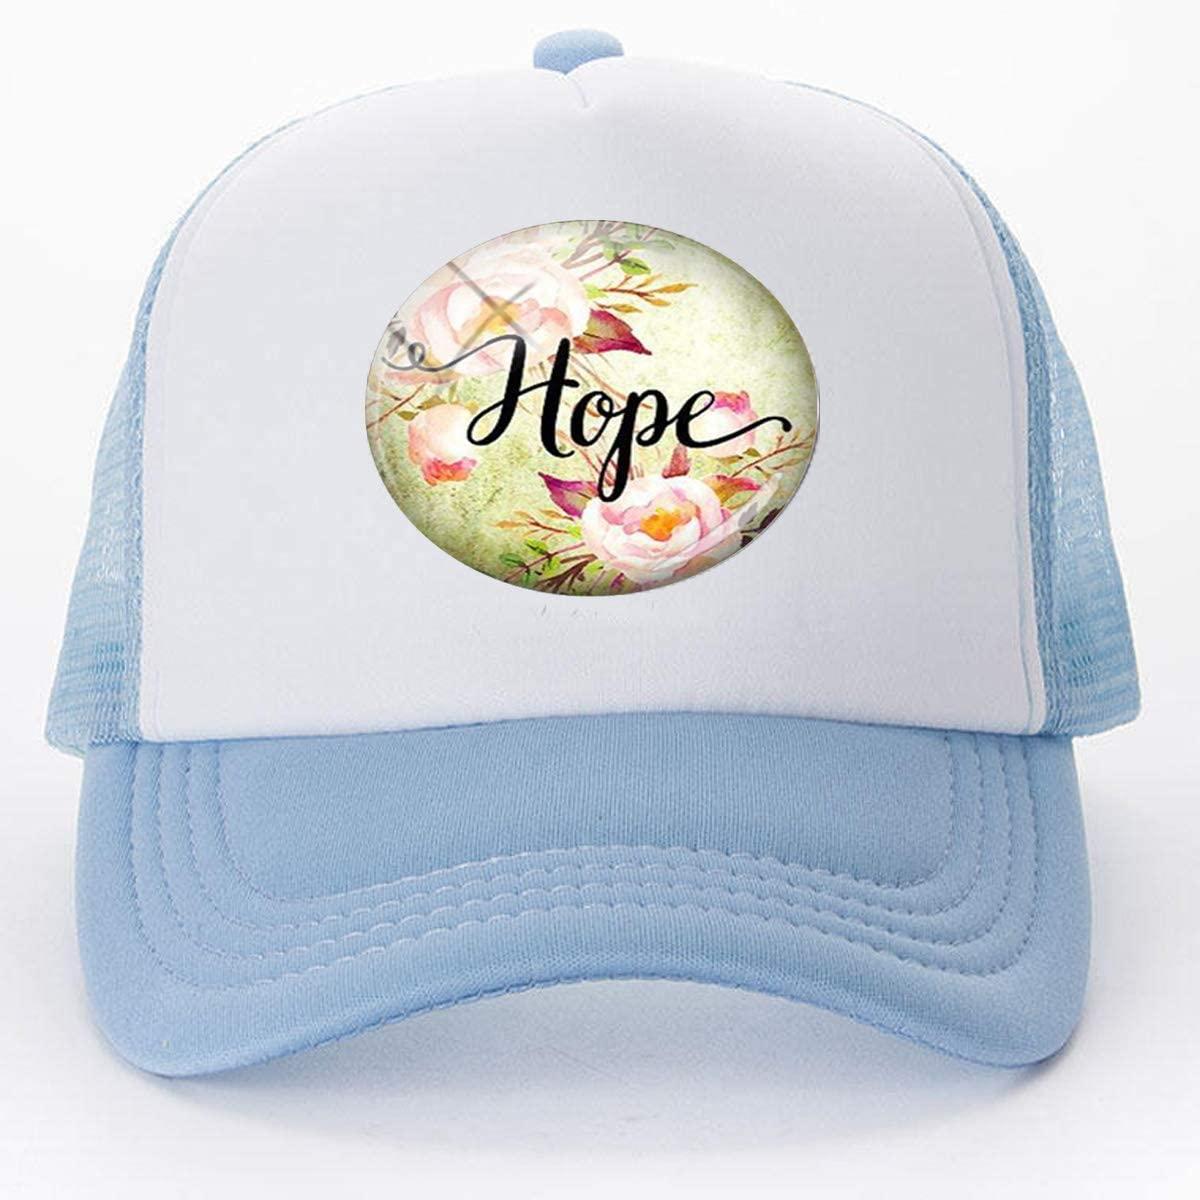 Bible Verse Pendants Faith,Dream,Hope,Believe Art Glass Dome Charms 2 Baseball caps Golf Caps Tennis hat